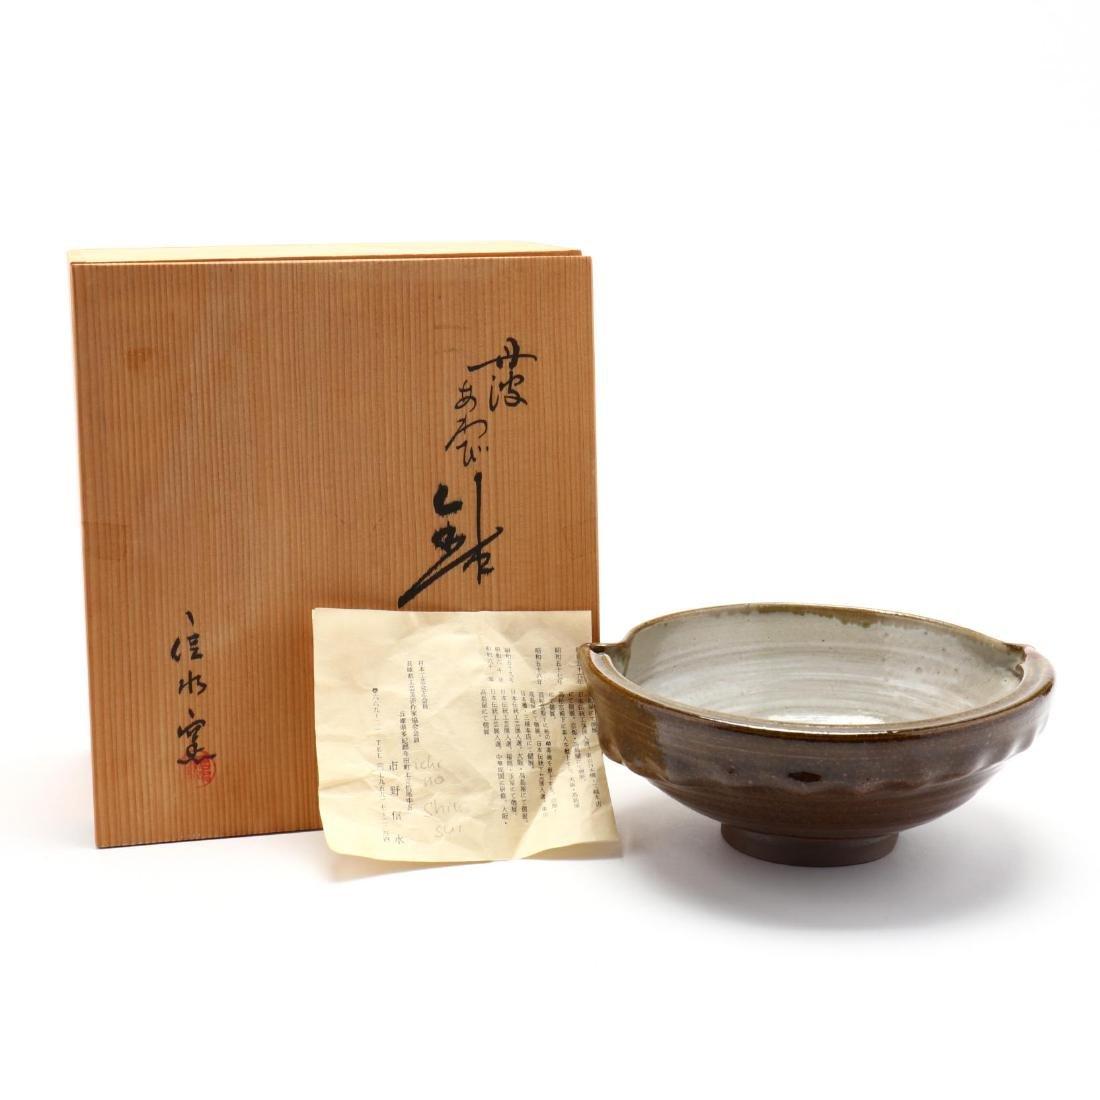 A Contemporary Japanese Ceramic Bowl by Ichino Shinsui - 5